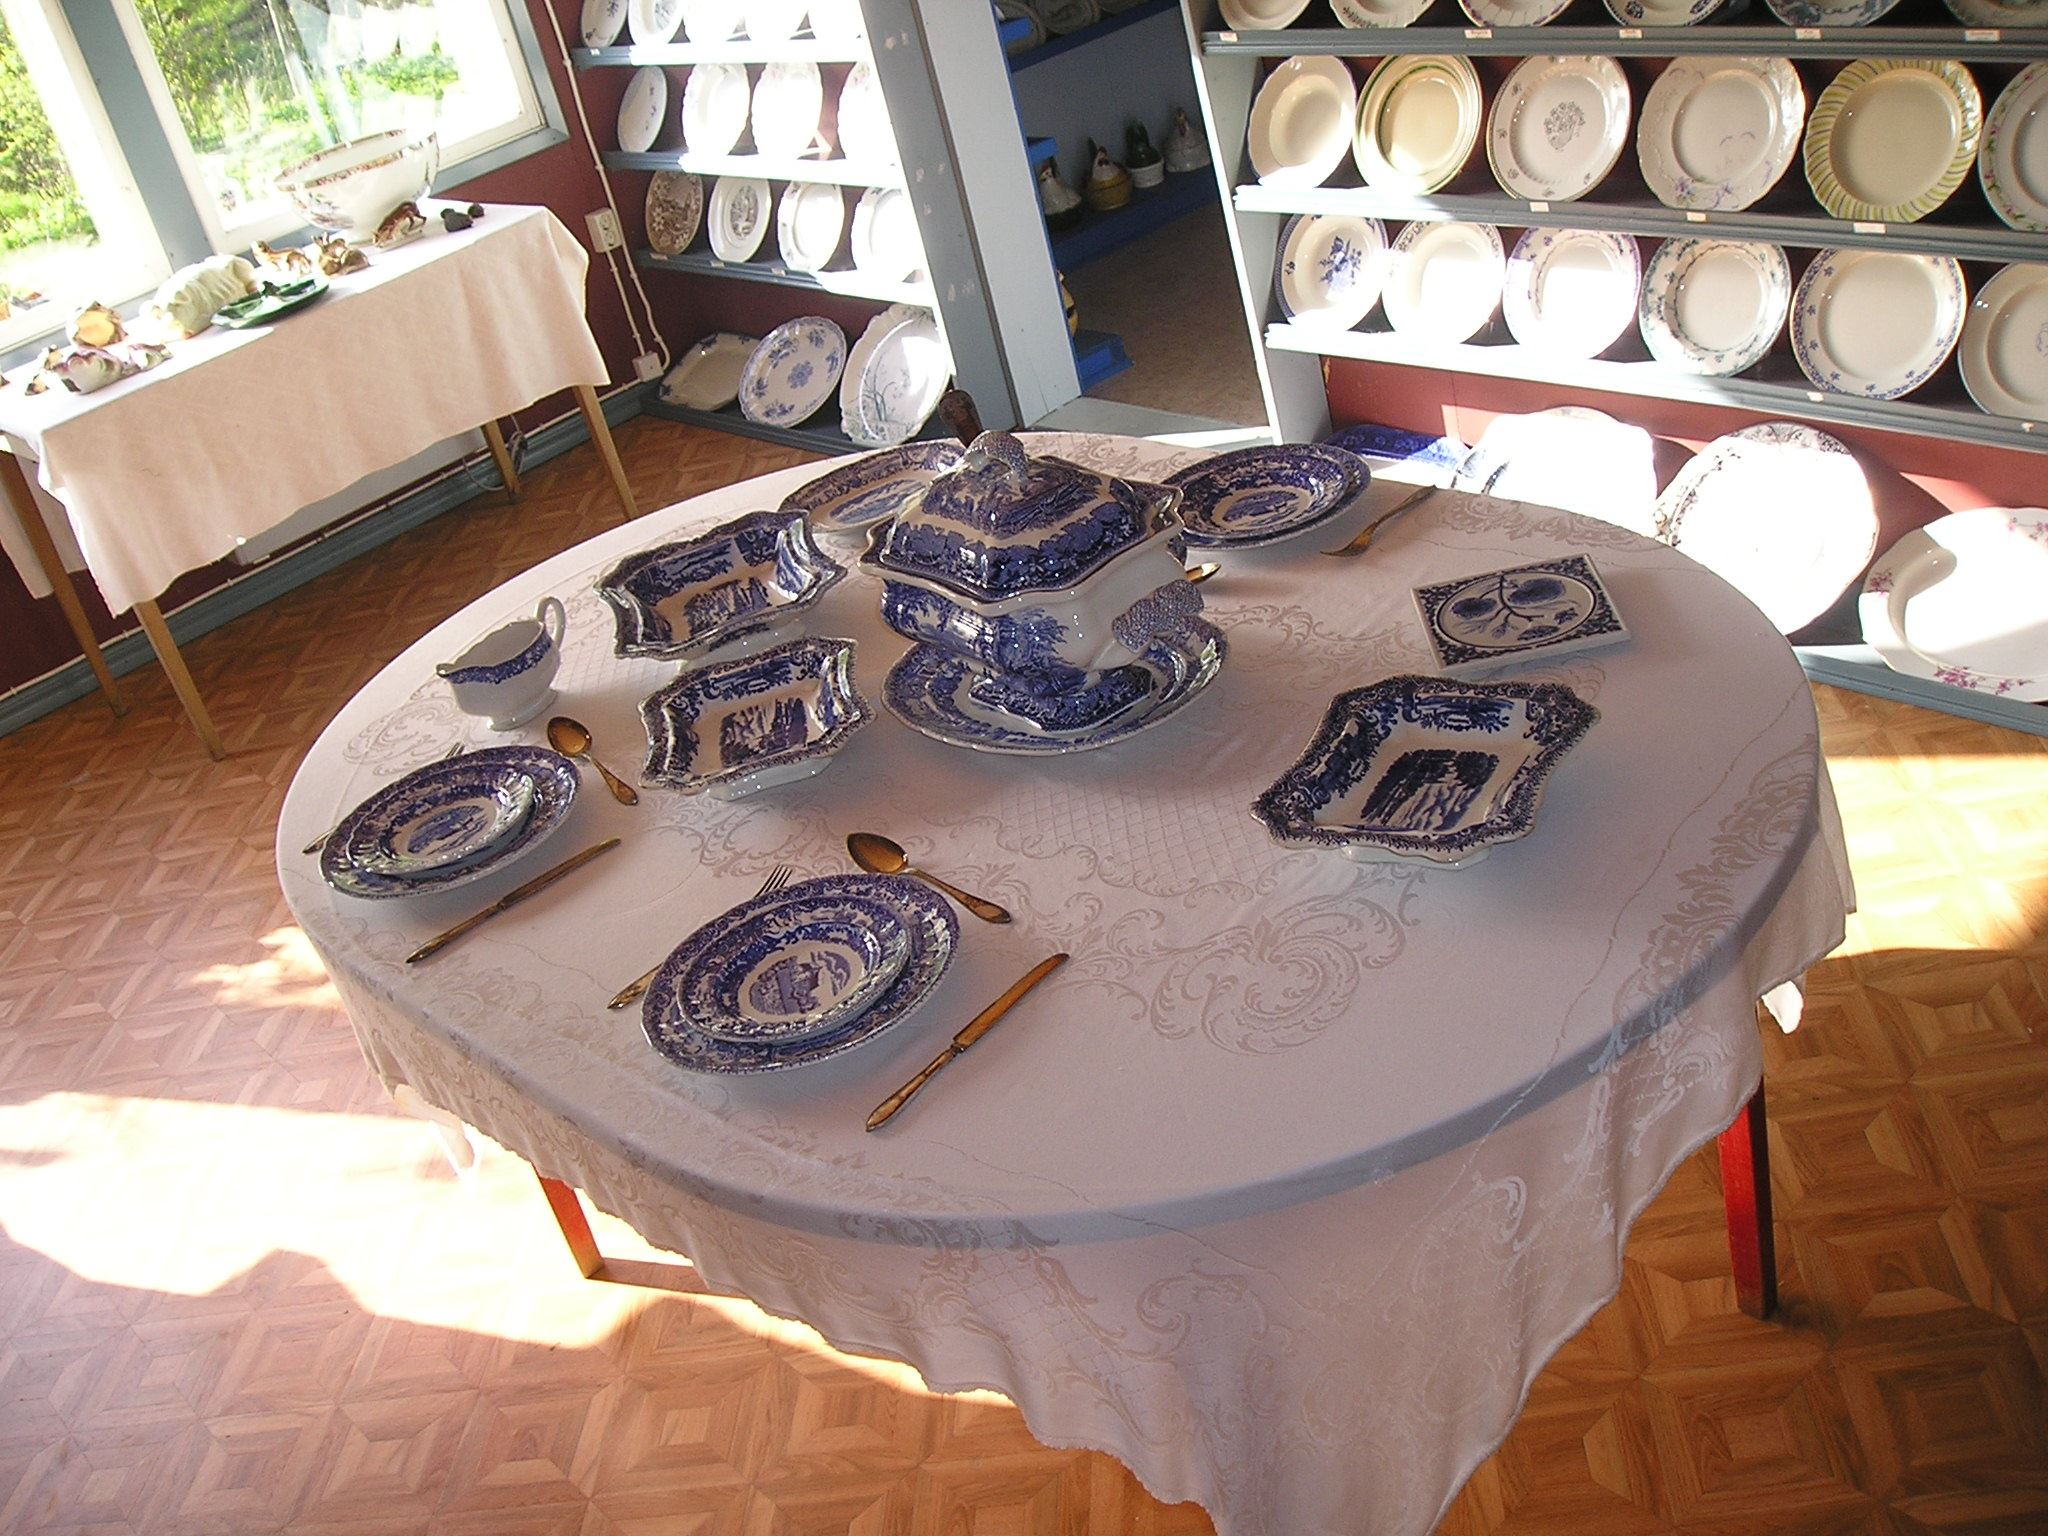 Porcelainmuséum Västerbotorp